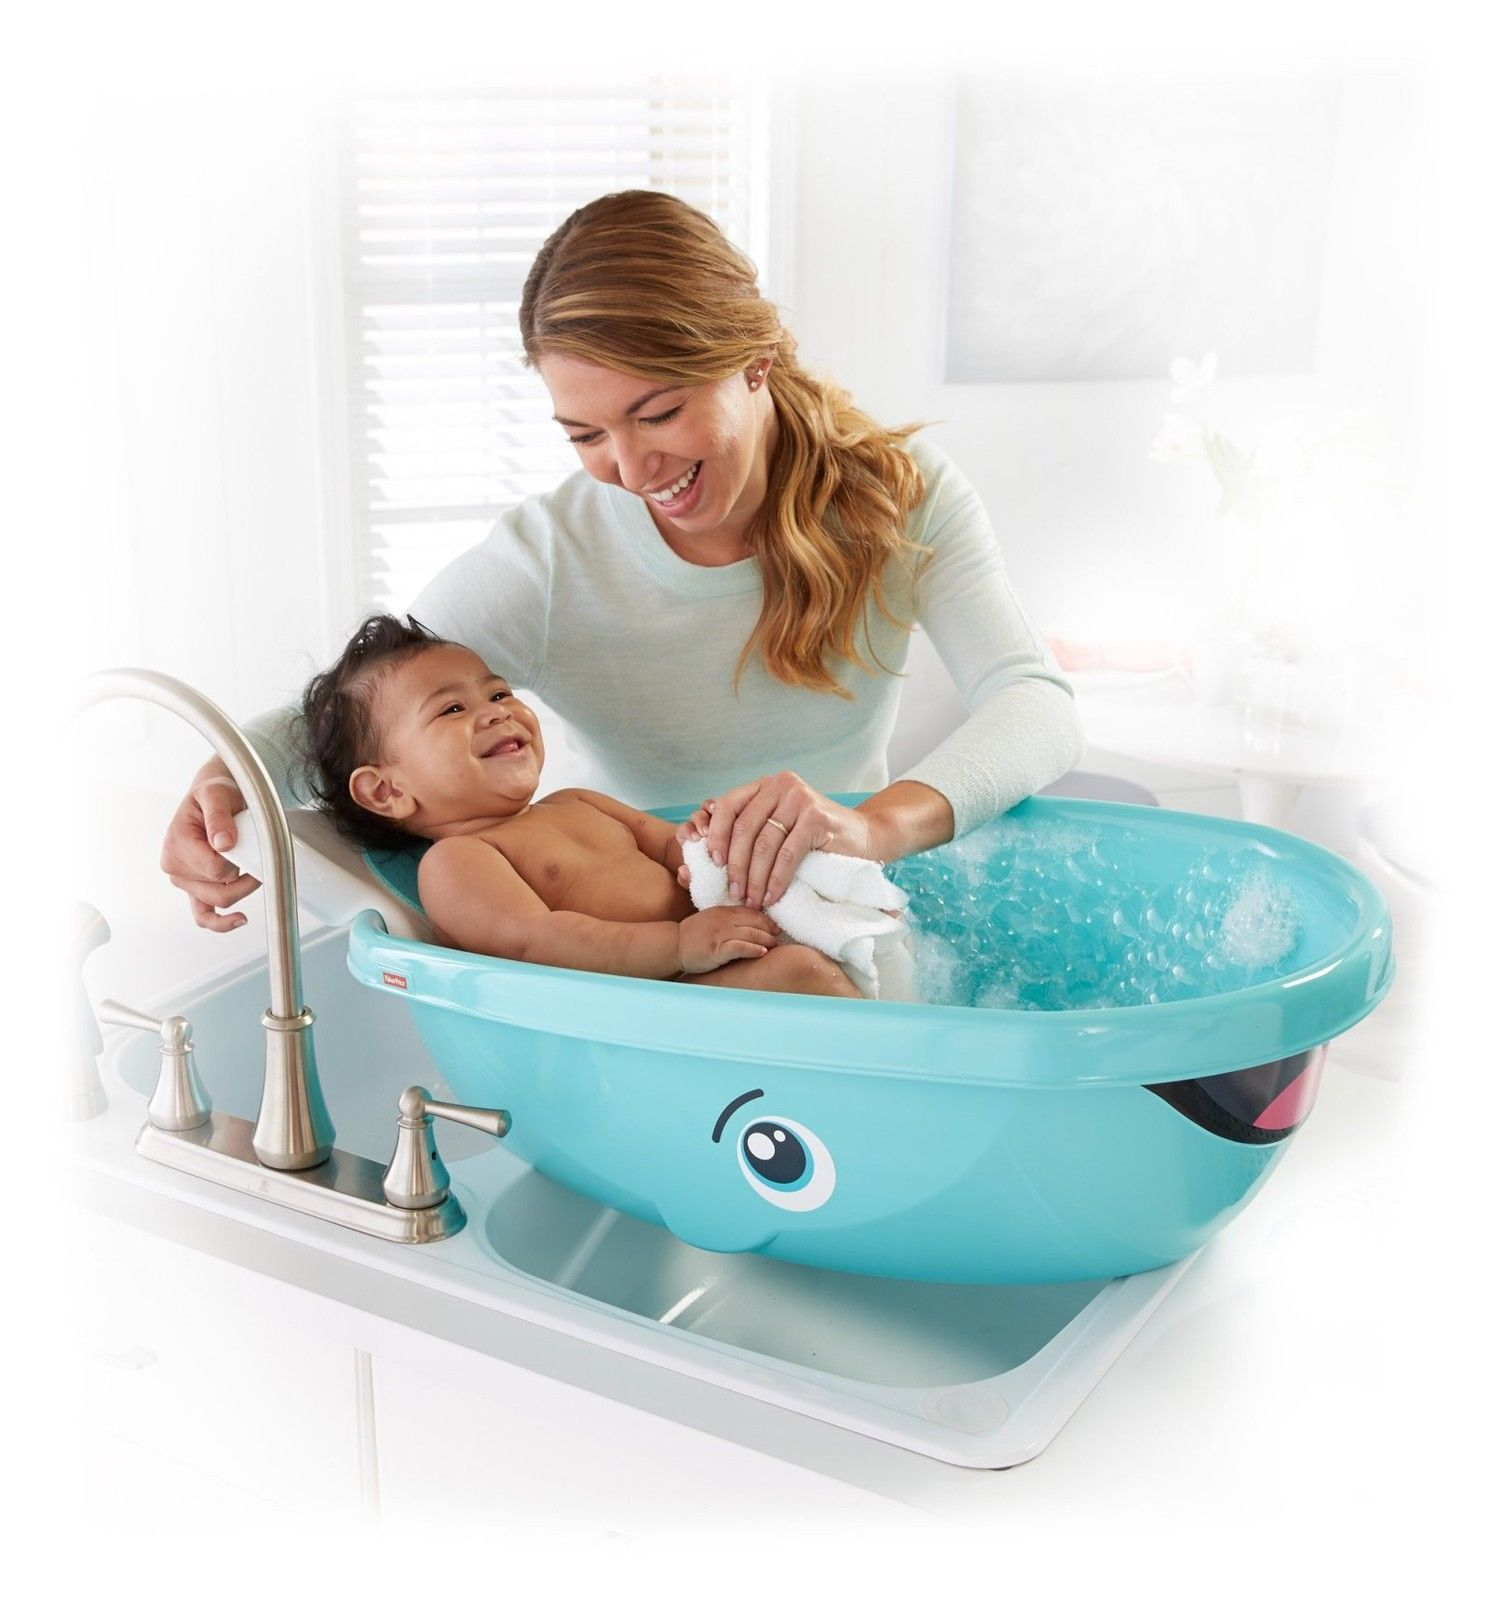 Nice Paint Bathtub Huge Painting A Bathtub Regular Paint For Bathtub How To Paint A Tub Young Paint Tub Blue Paint A Bathtub